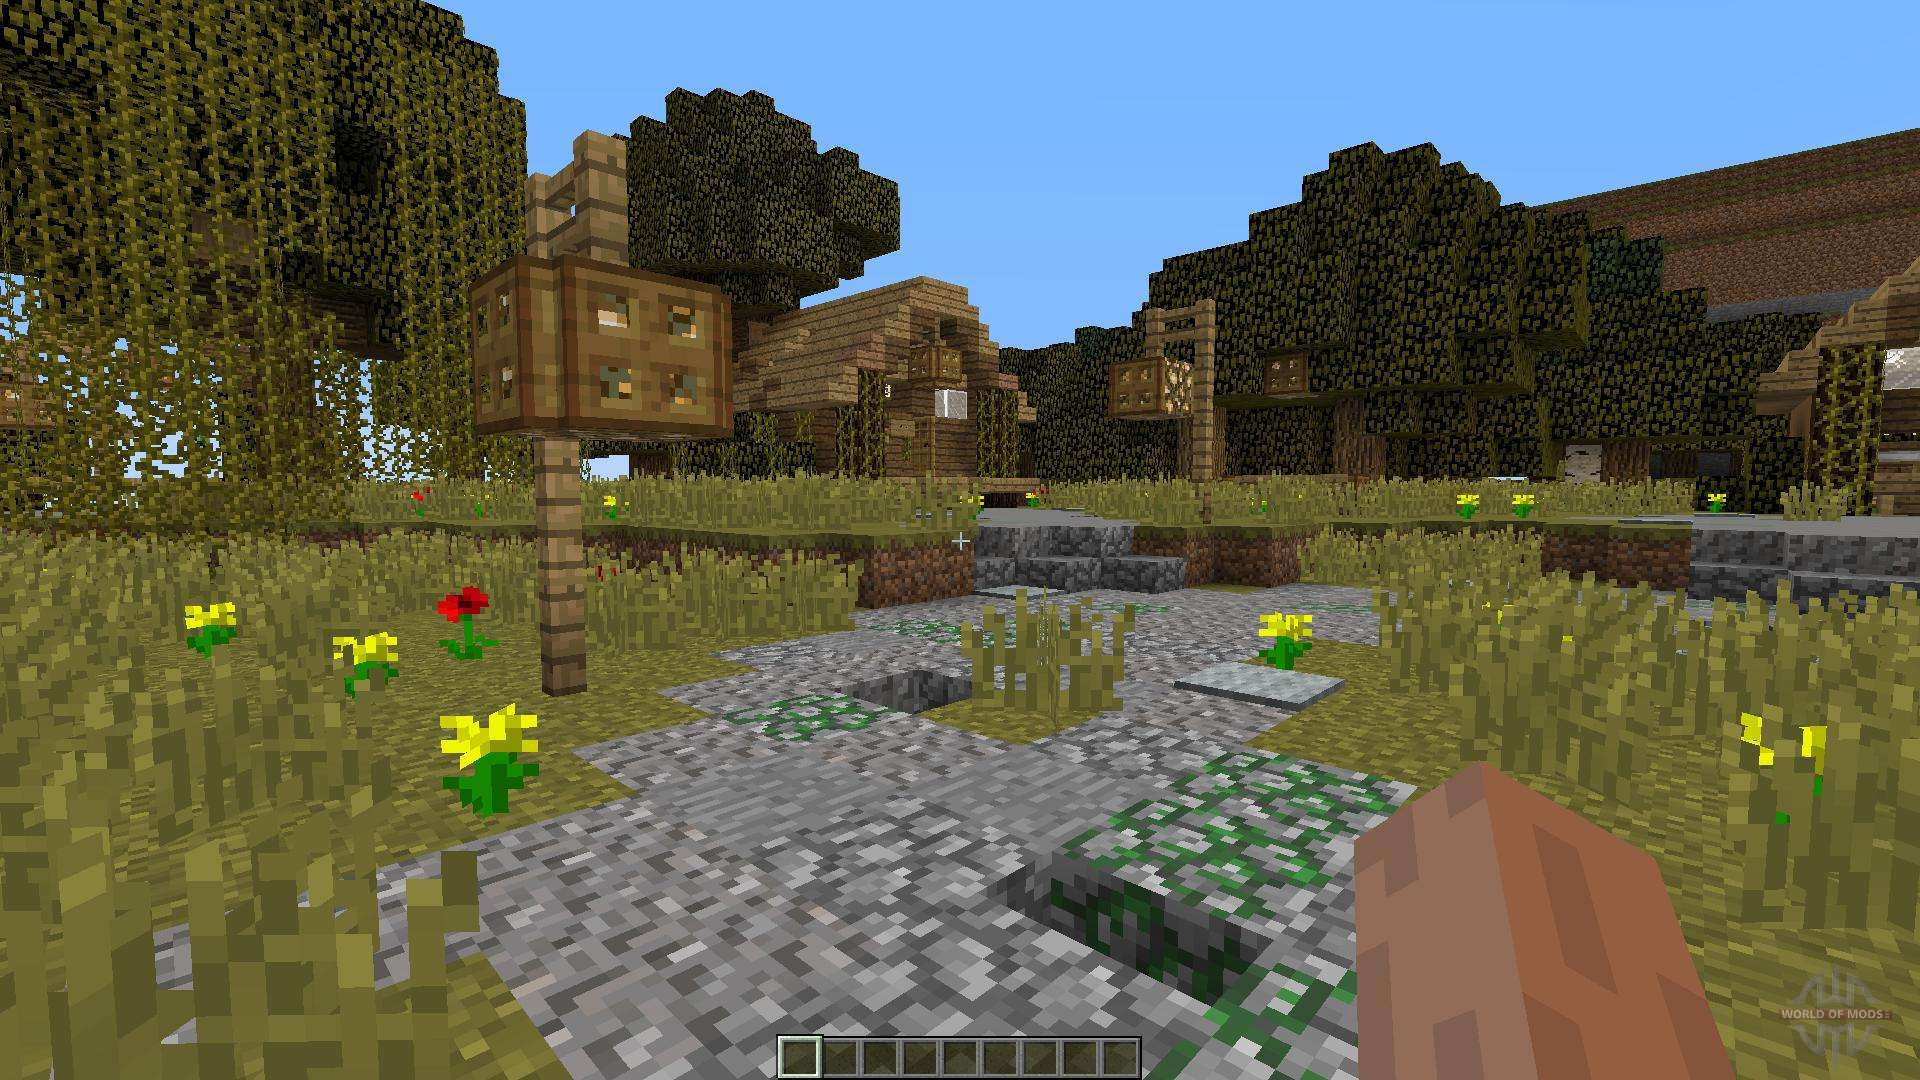 Minecraft Zombie Survival Map for Minecraft